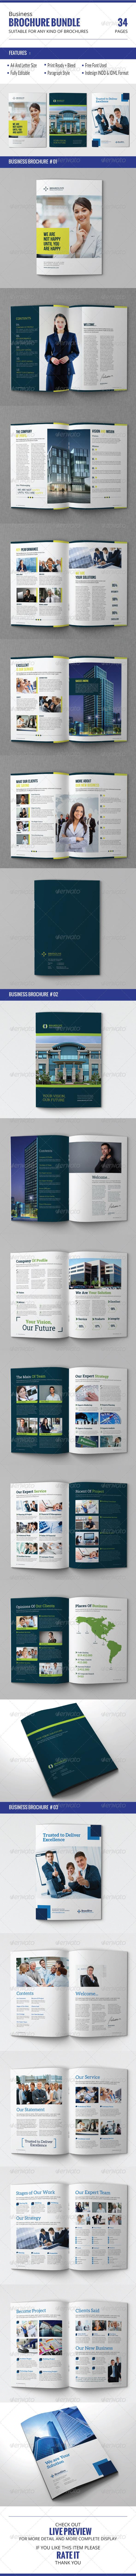 GraphicRiver Business Brochure Bundle Vol 01 8049895